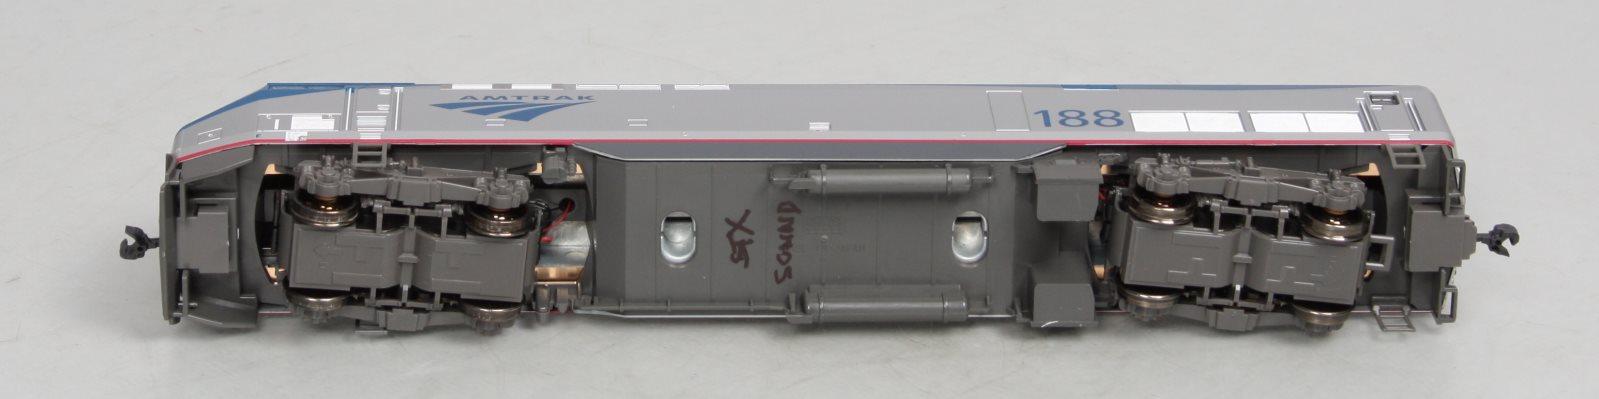 Kato 37 6108 Ho Ge P42 With Standard Dc Genesis Amtrak Phase